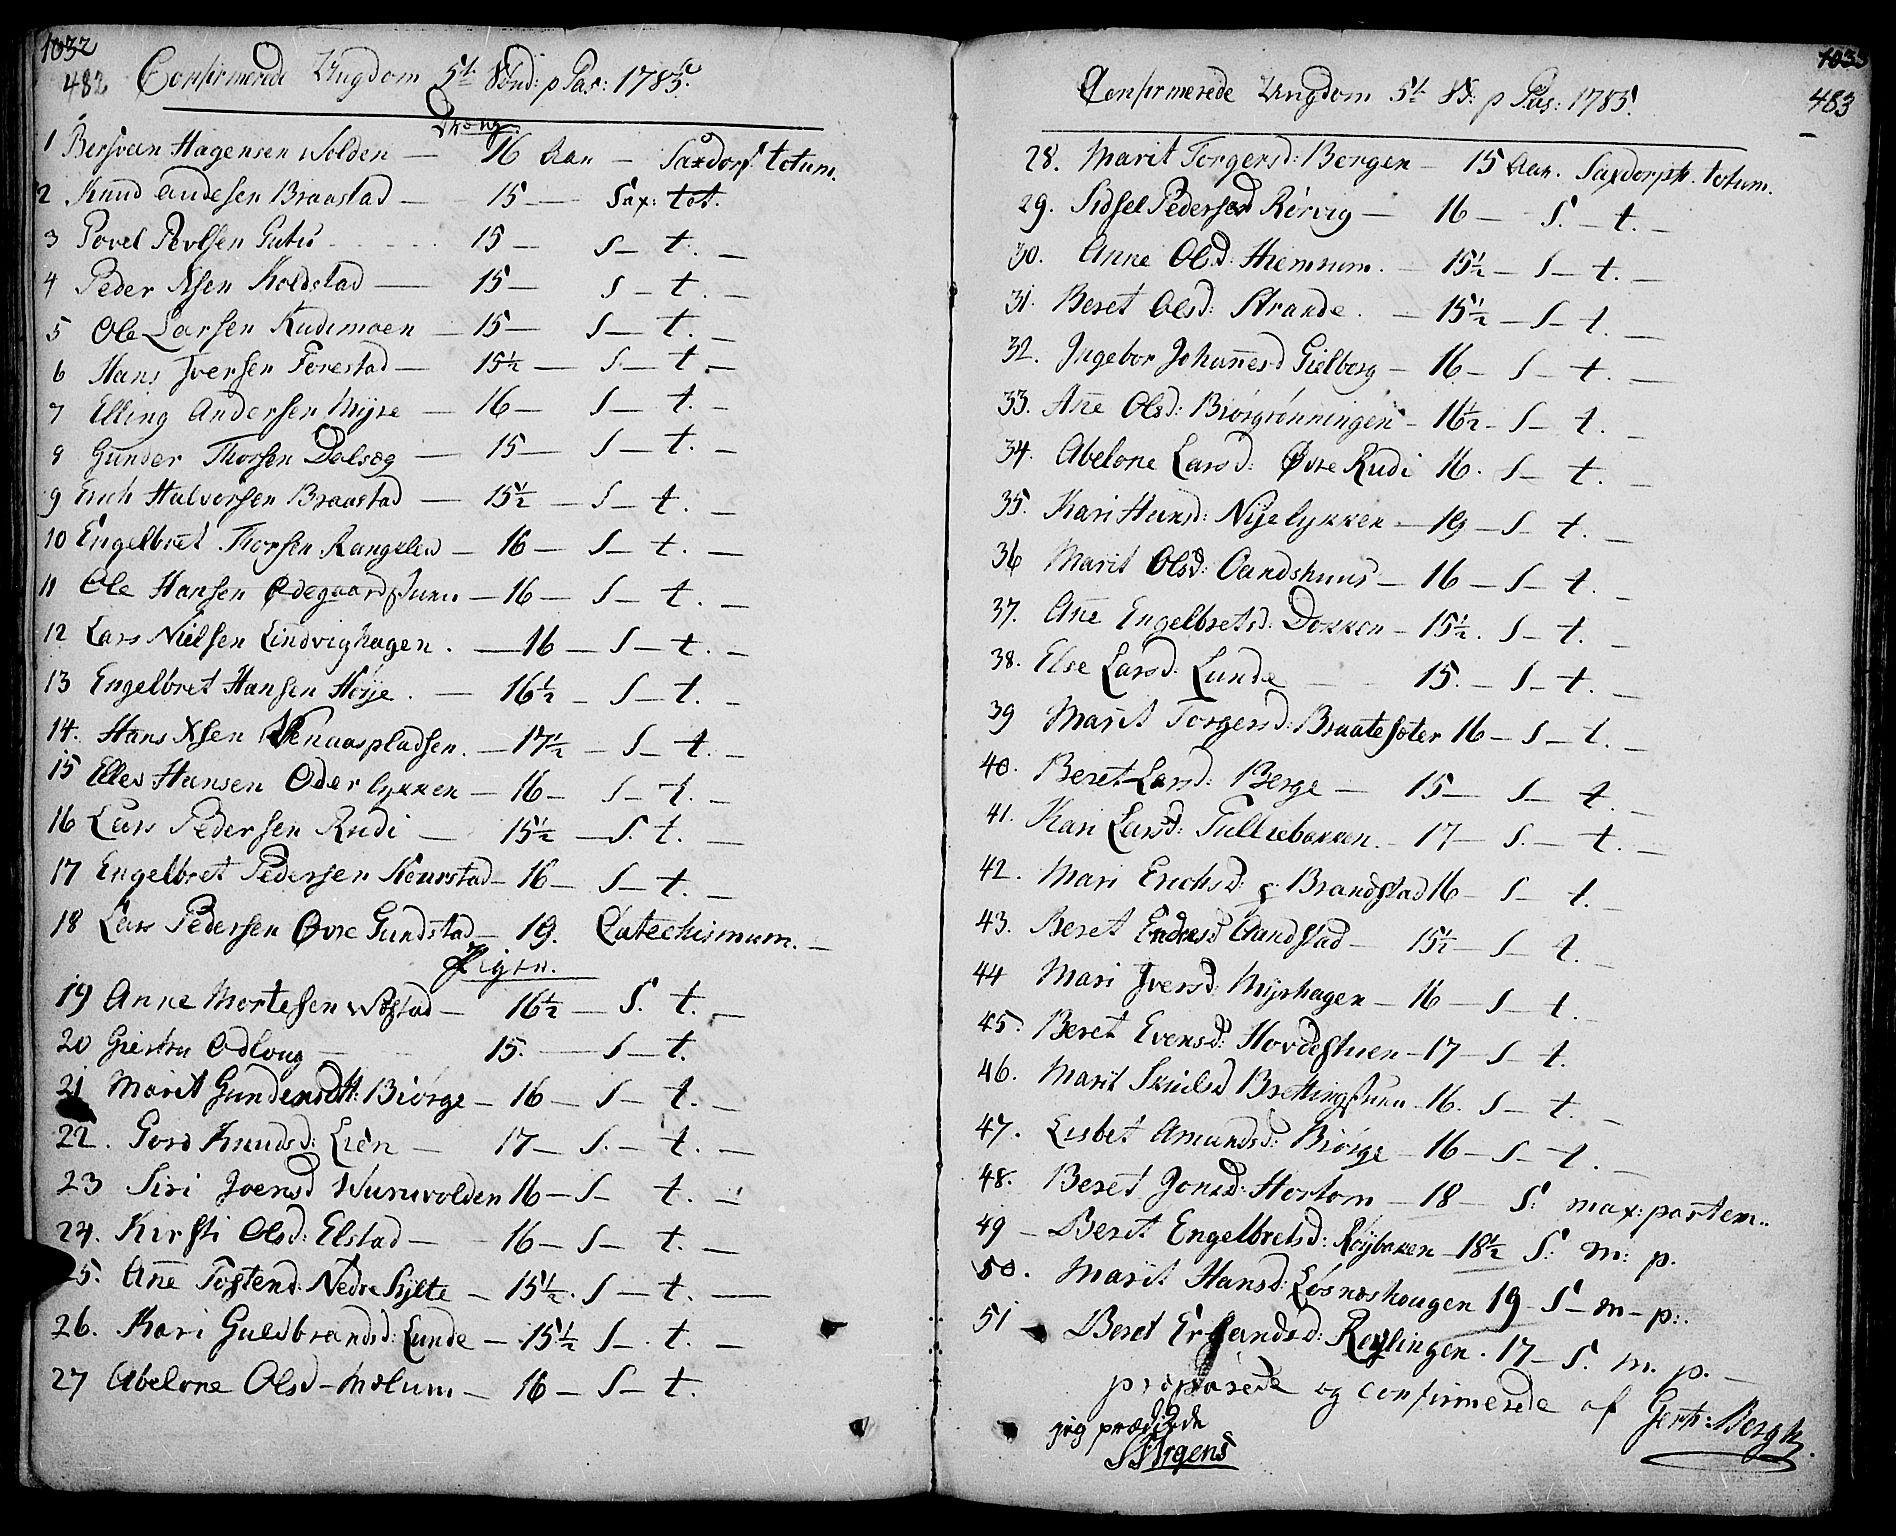 SAH, Ringebu prestekontor, Ministerialbok nr. 3, 1781-1820, s. 482-483